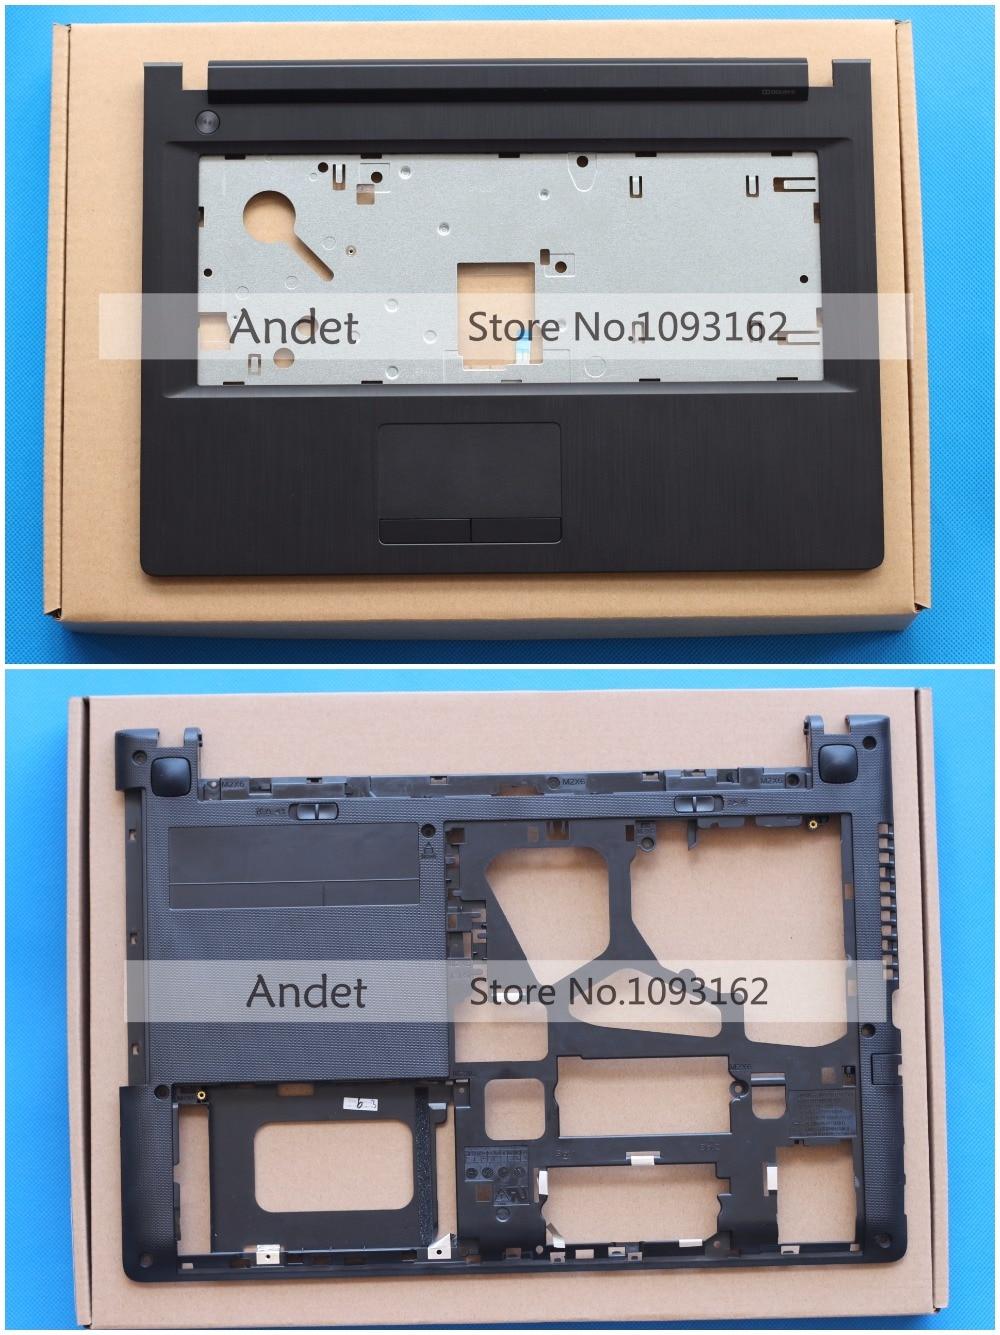 New Original For Lenovo G40 G40-30 G40-45 G40-70 G40-80 Z40 Z40-30 Z40-45 Z40-70 Z40-80 Palmrest Cover Upper Case+Bottom Base free shipping laptop bottom case for lenovo g40 70at g40 70am series replace cover d shell